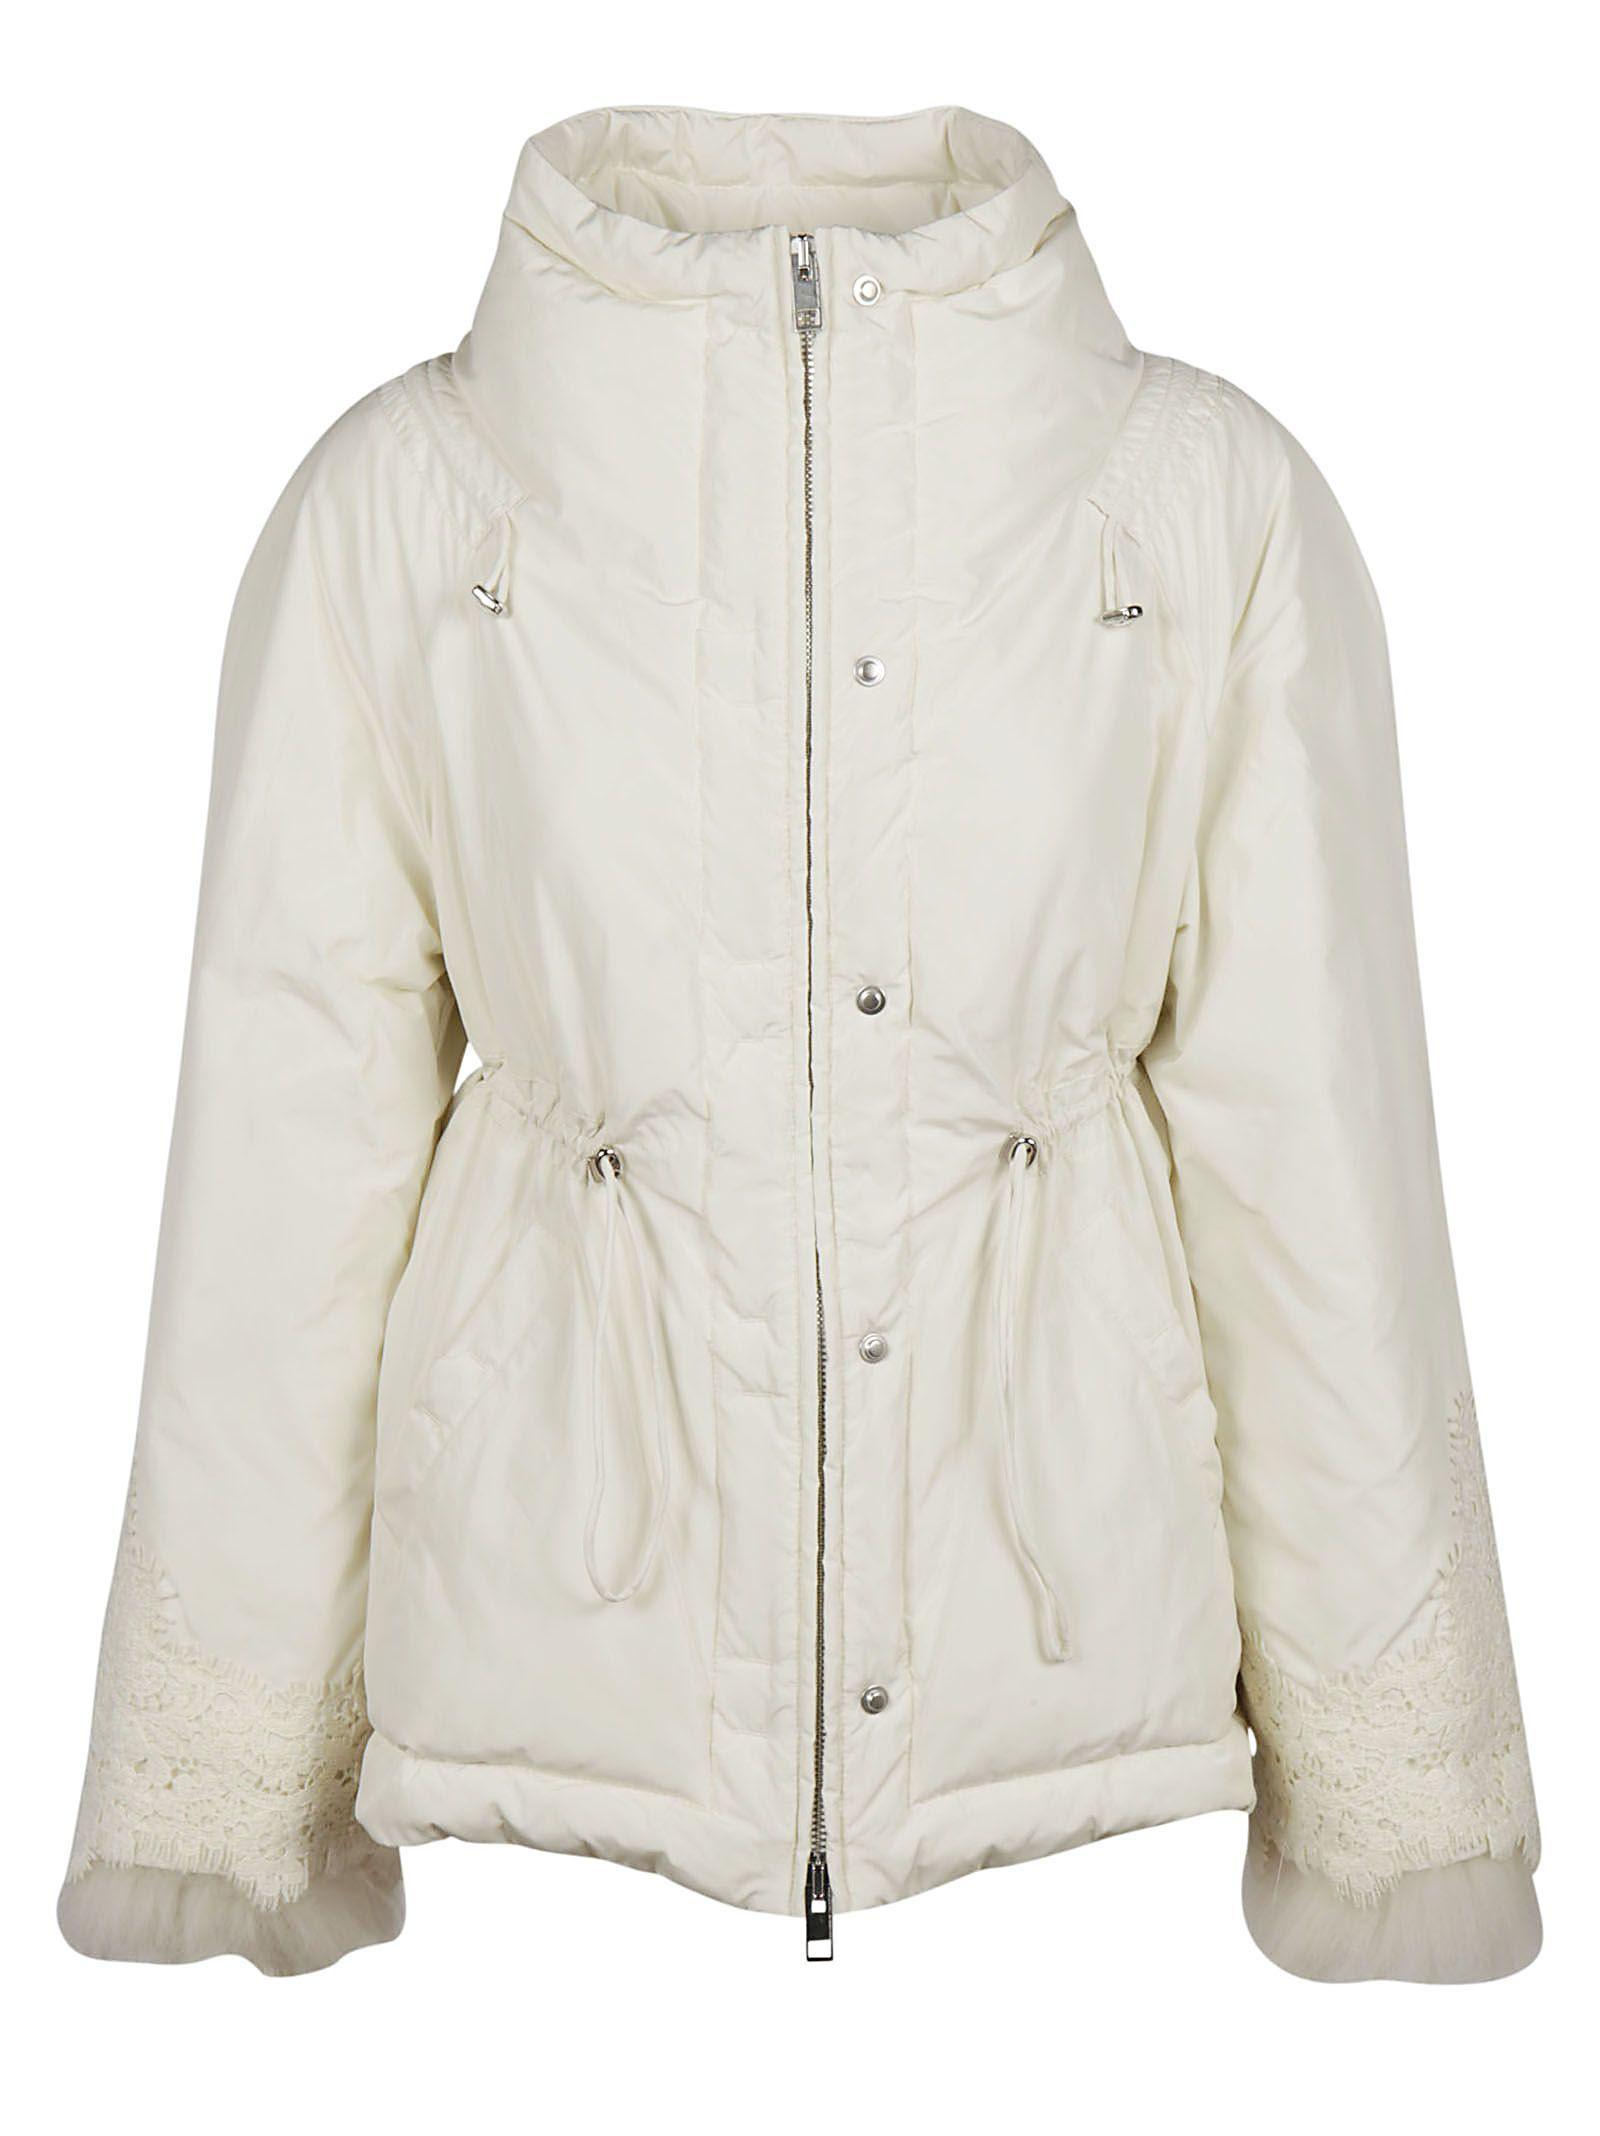 Ermanno Scervino Fur Trim Jacket In White